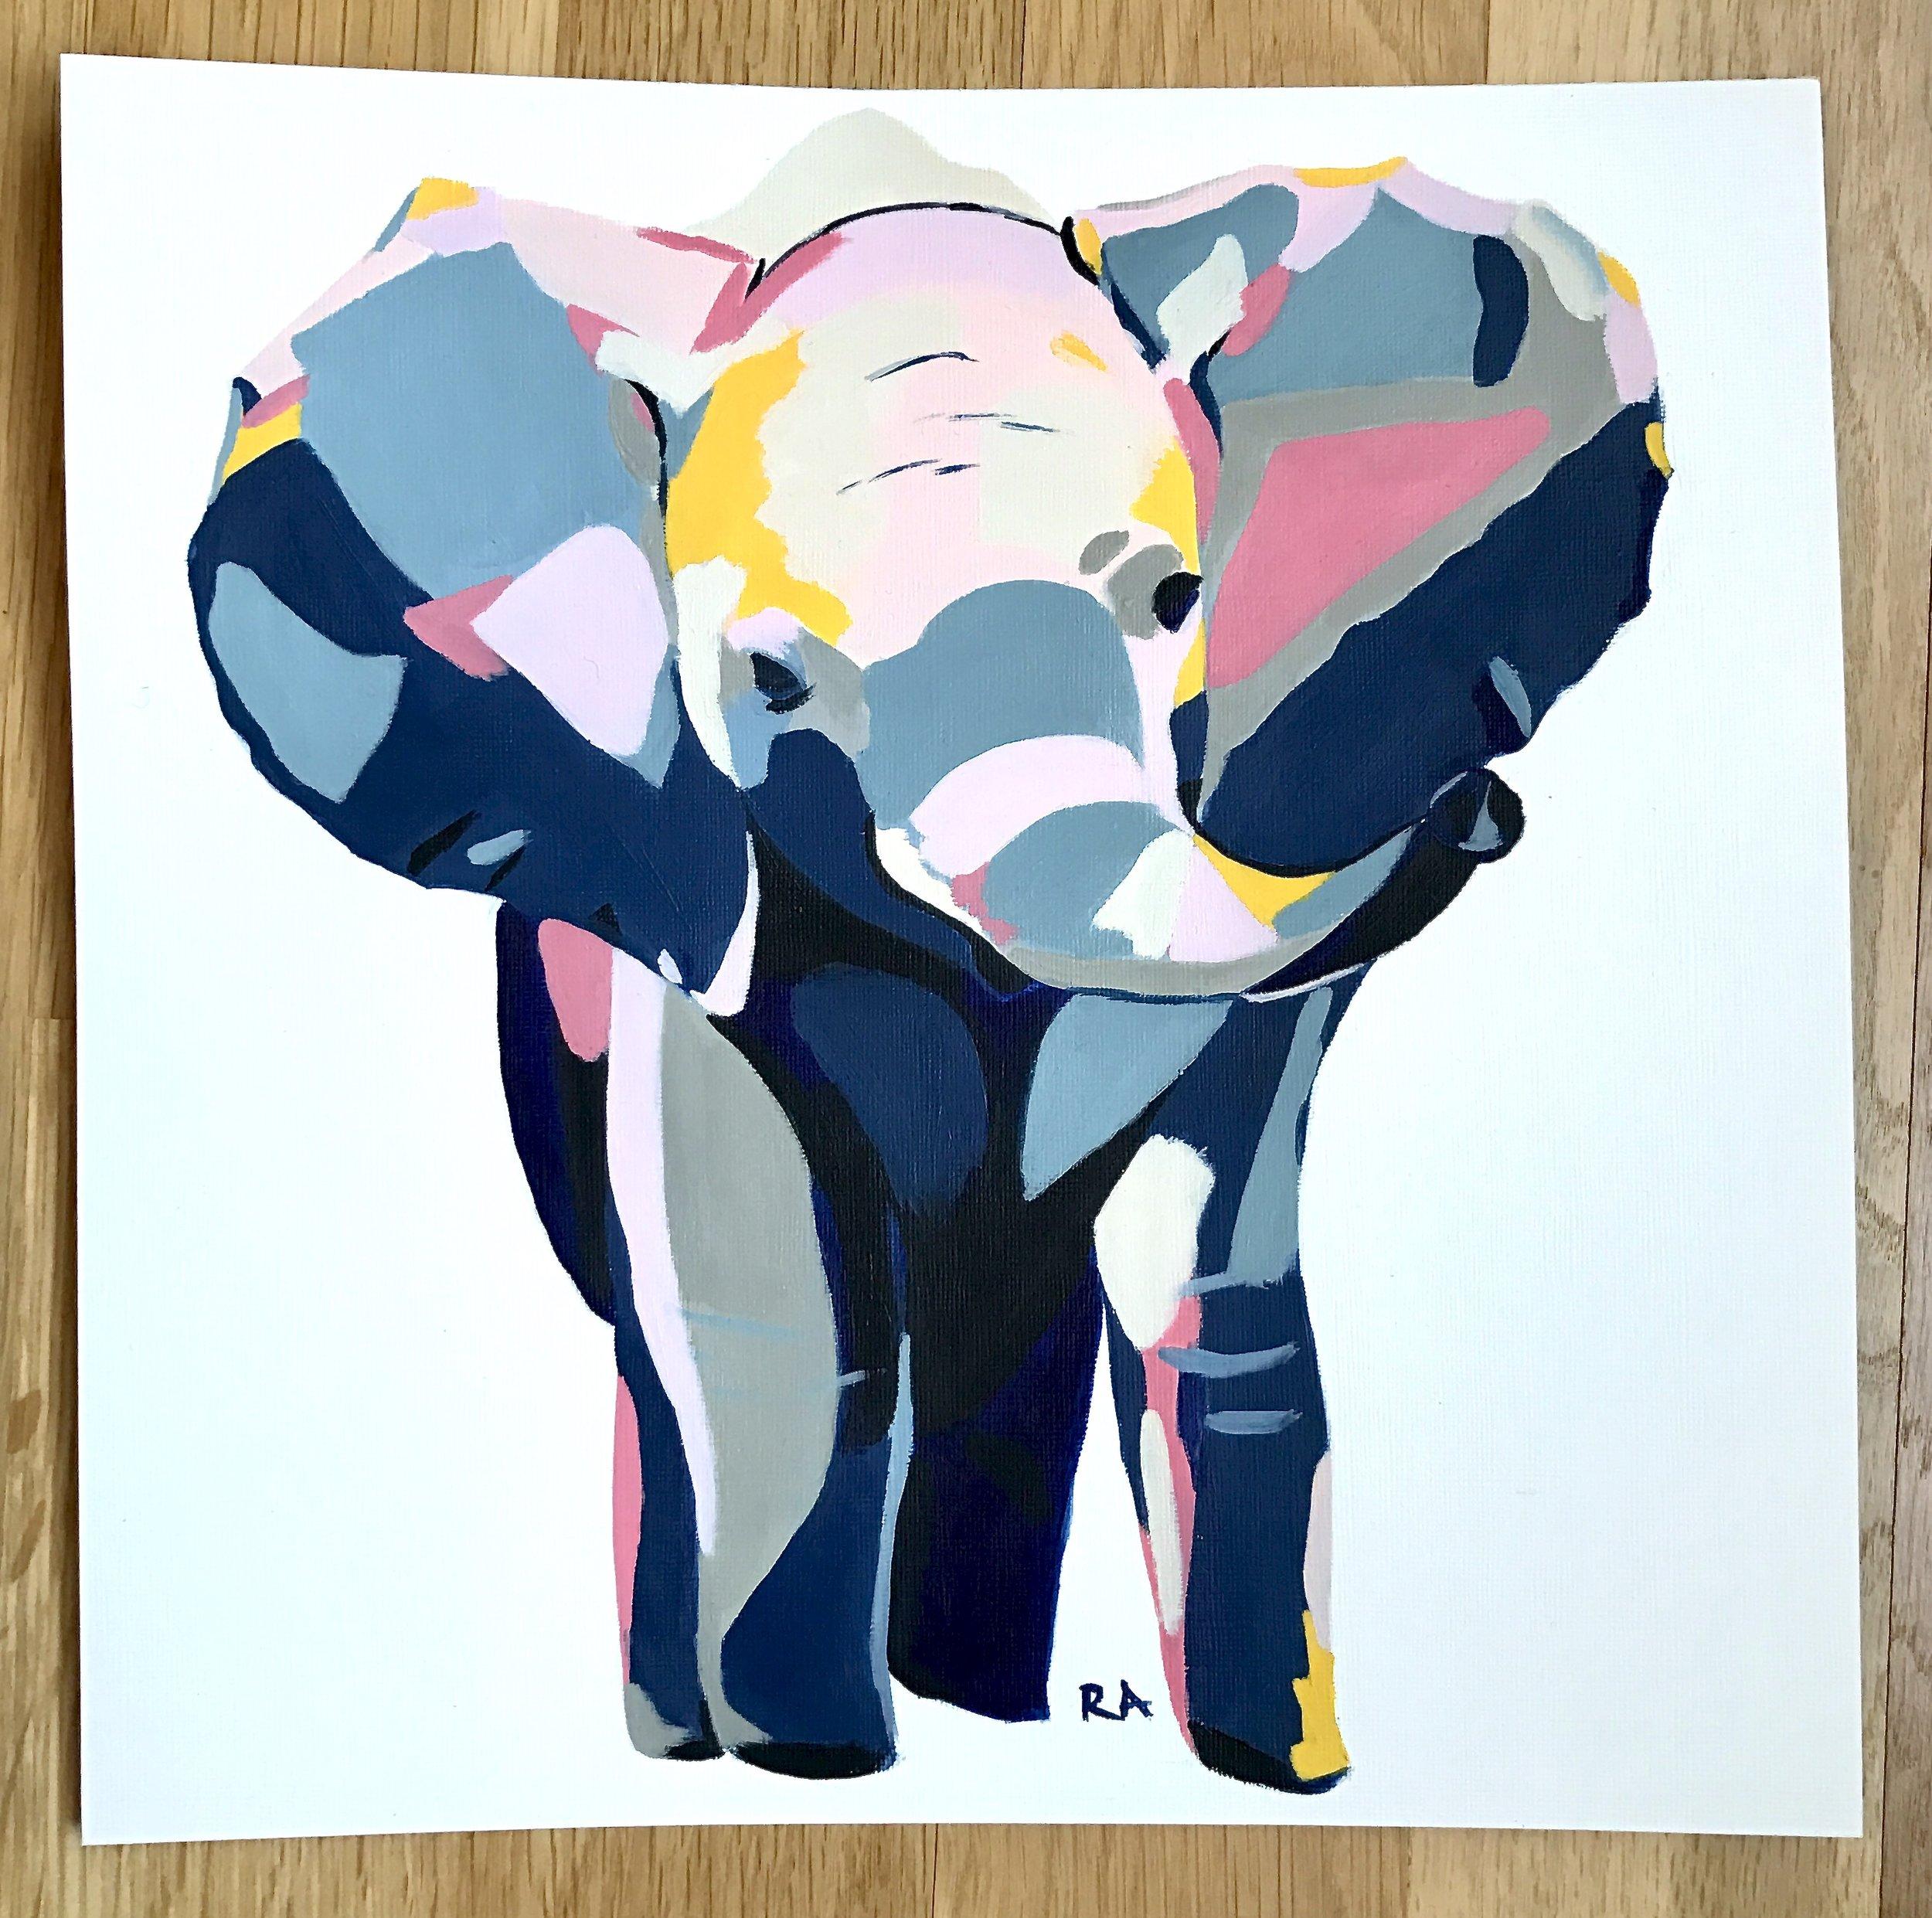 (SOLD) Elephant, 2016